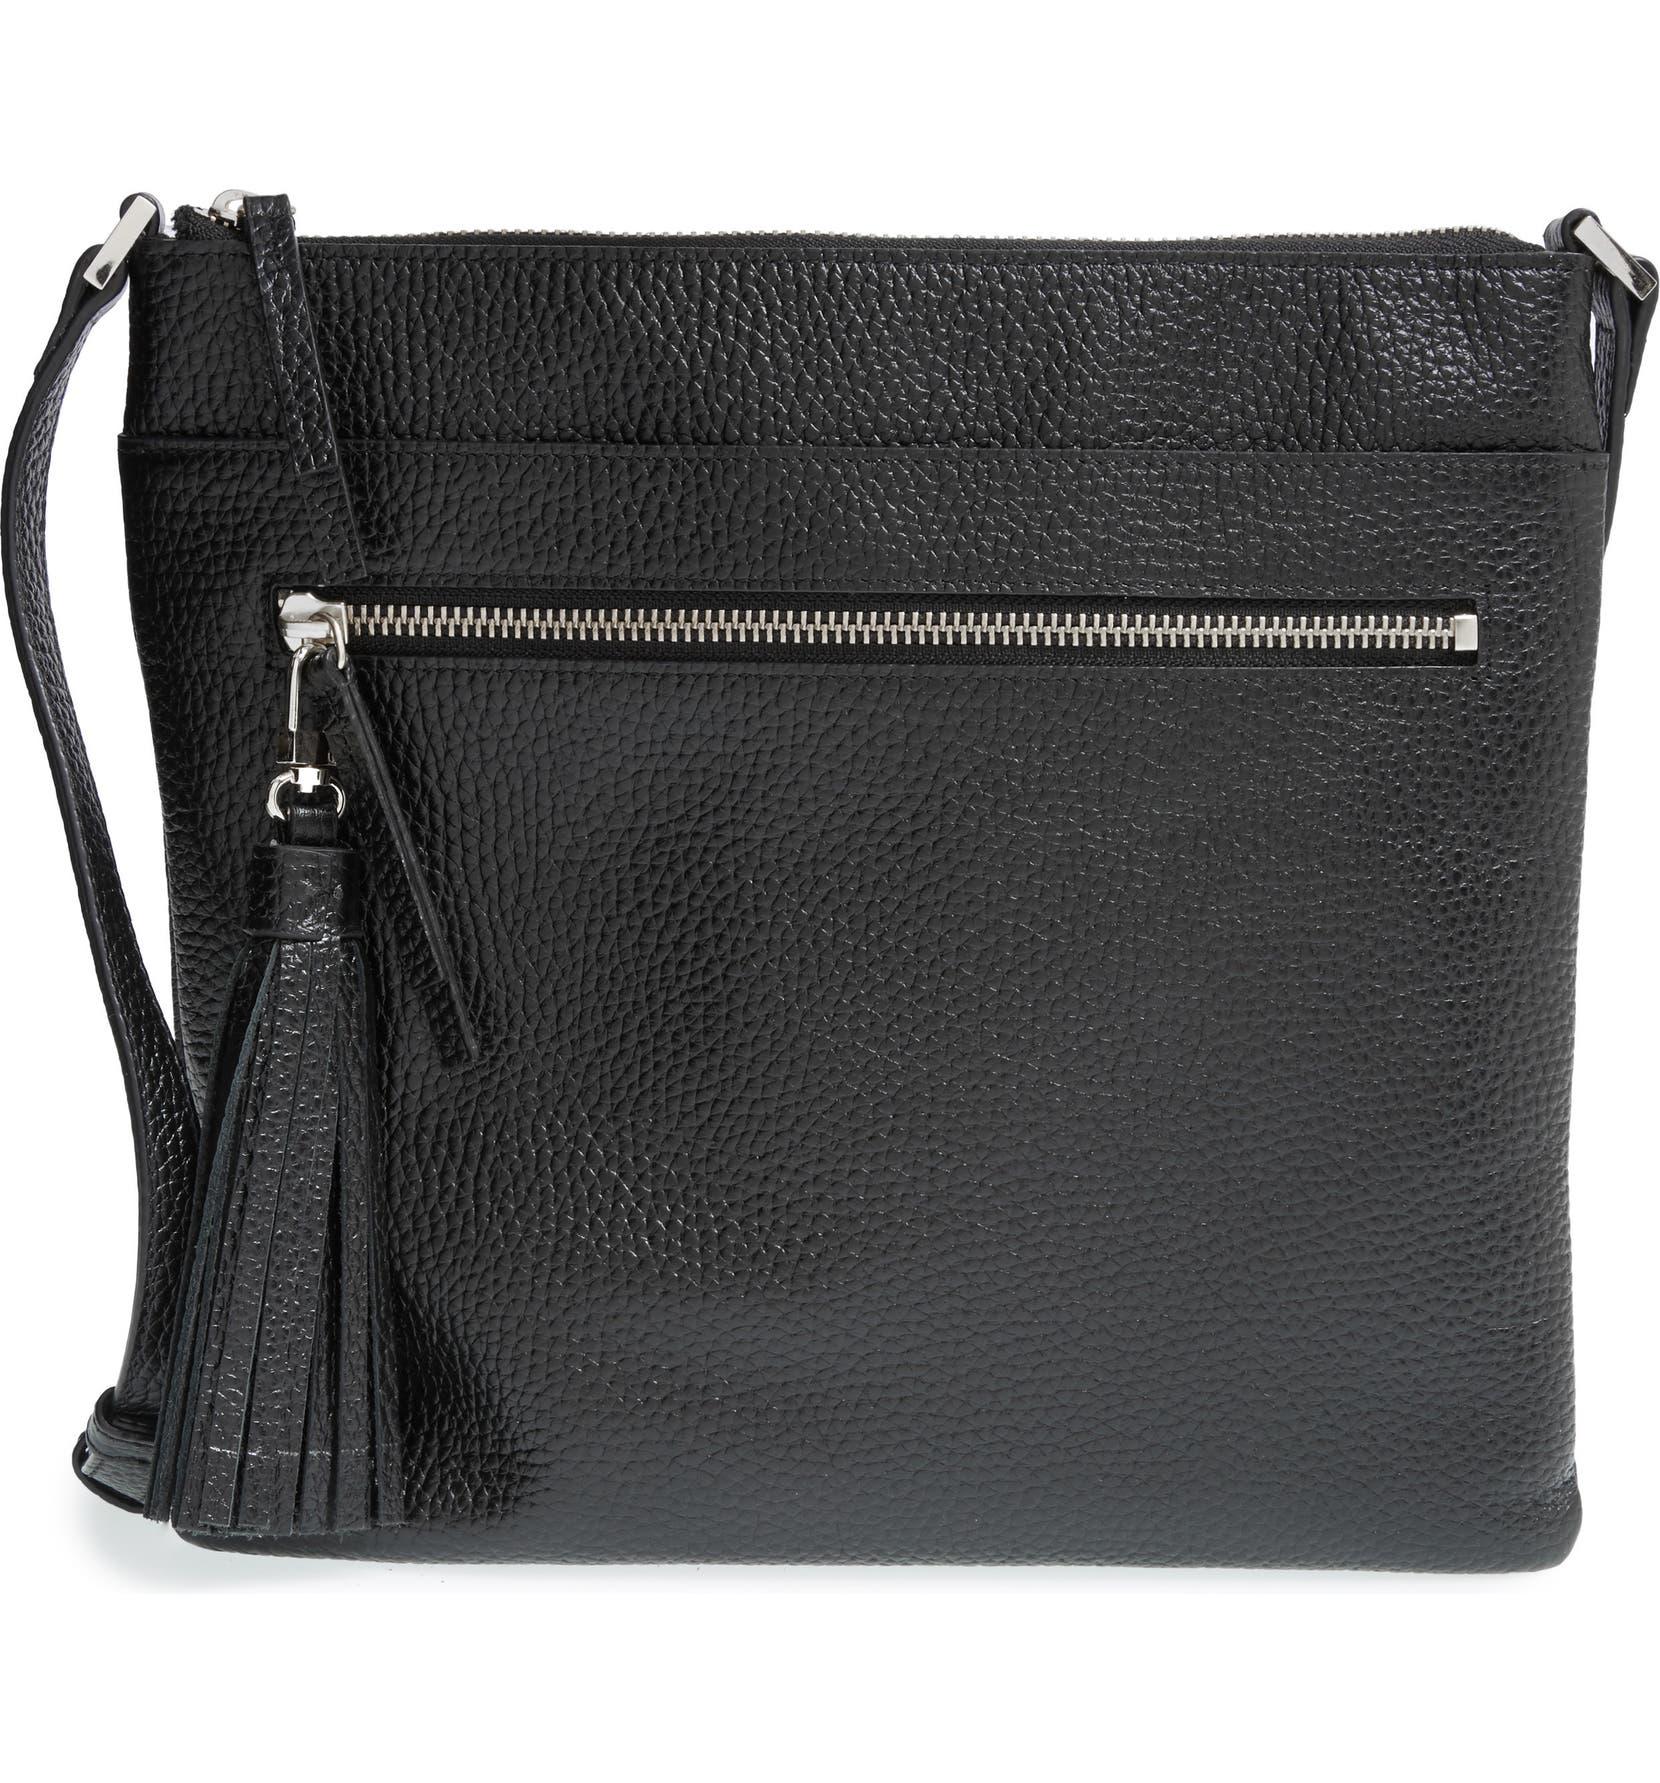 6246521e10eed6 Halogen® Tasseled Leather Crossbody Bag | Nordstrom